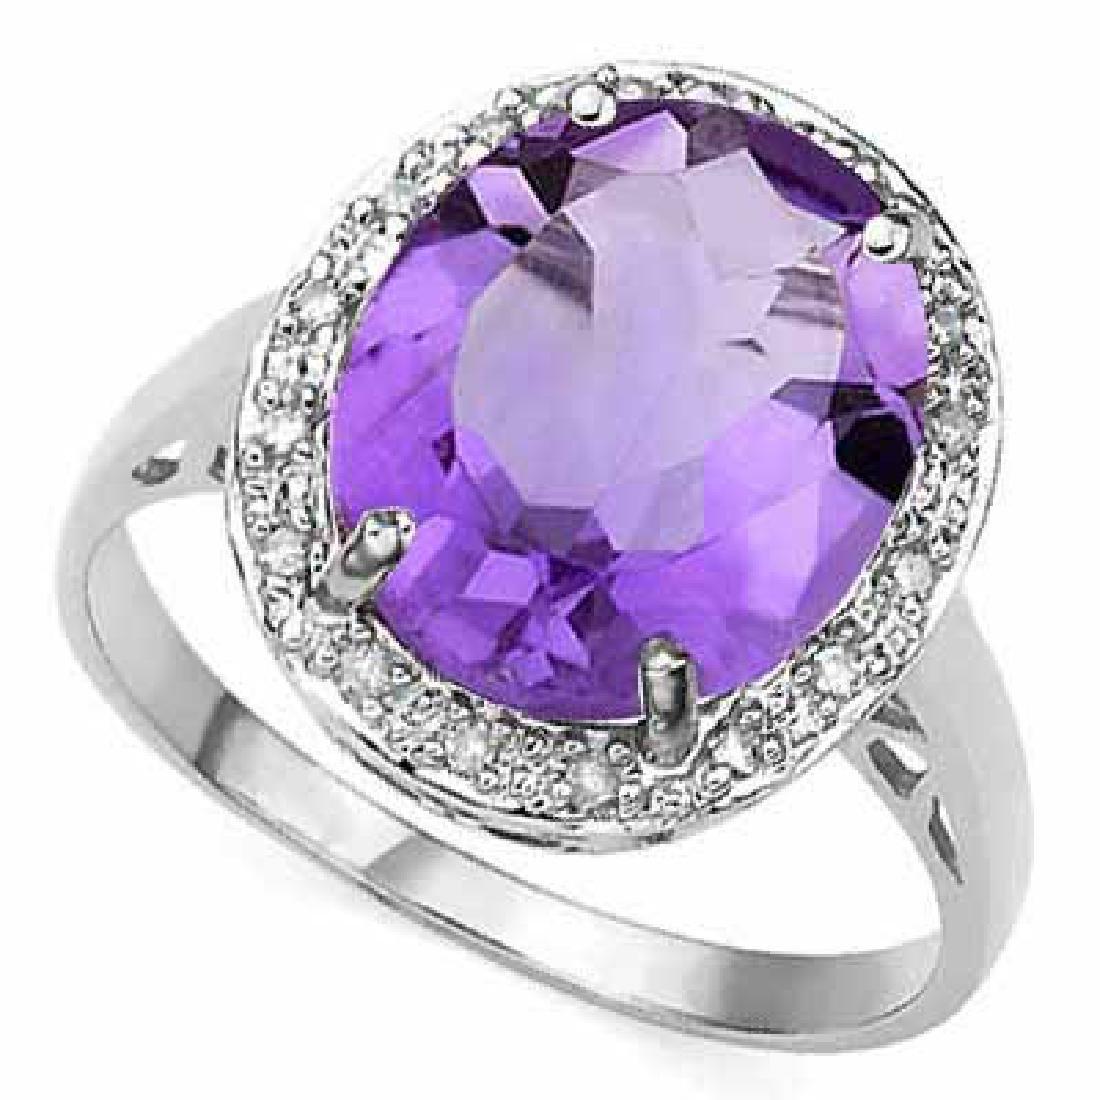 4 1/4 CARAT AMETHYST & DIAMOND 925 STERLING SILVER RING